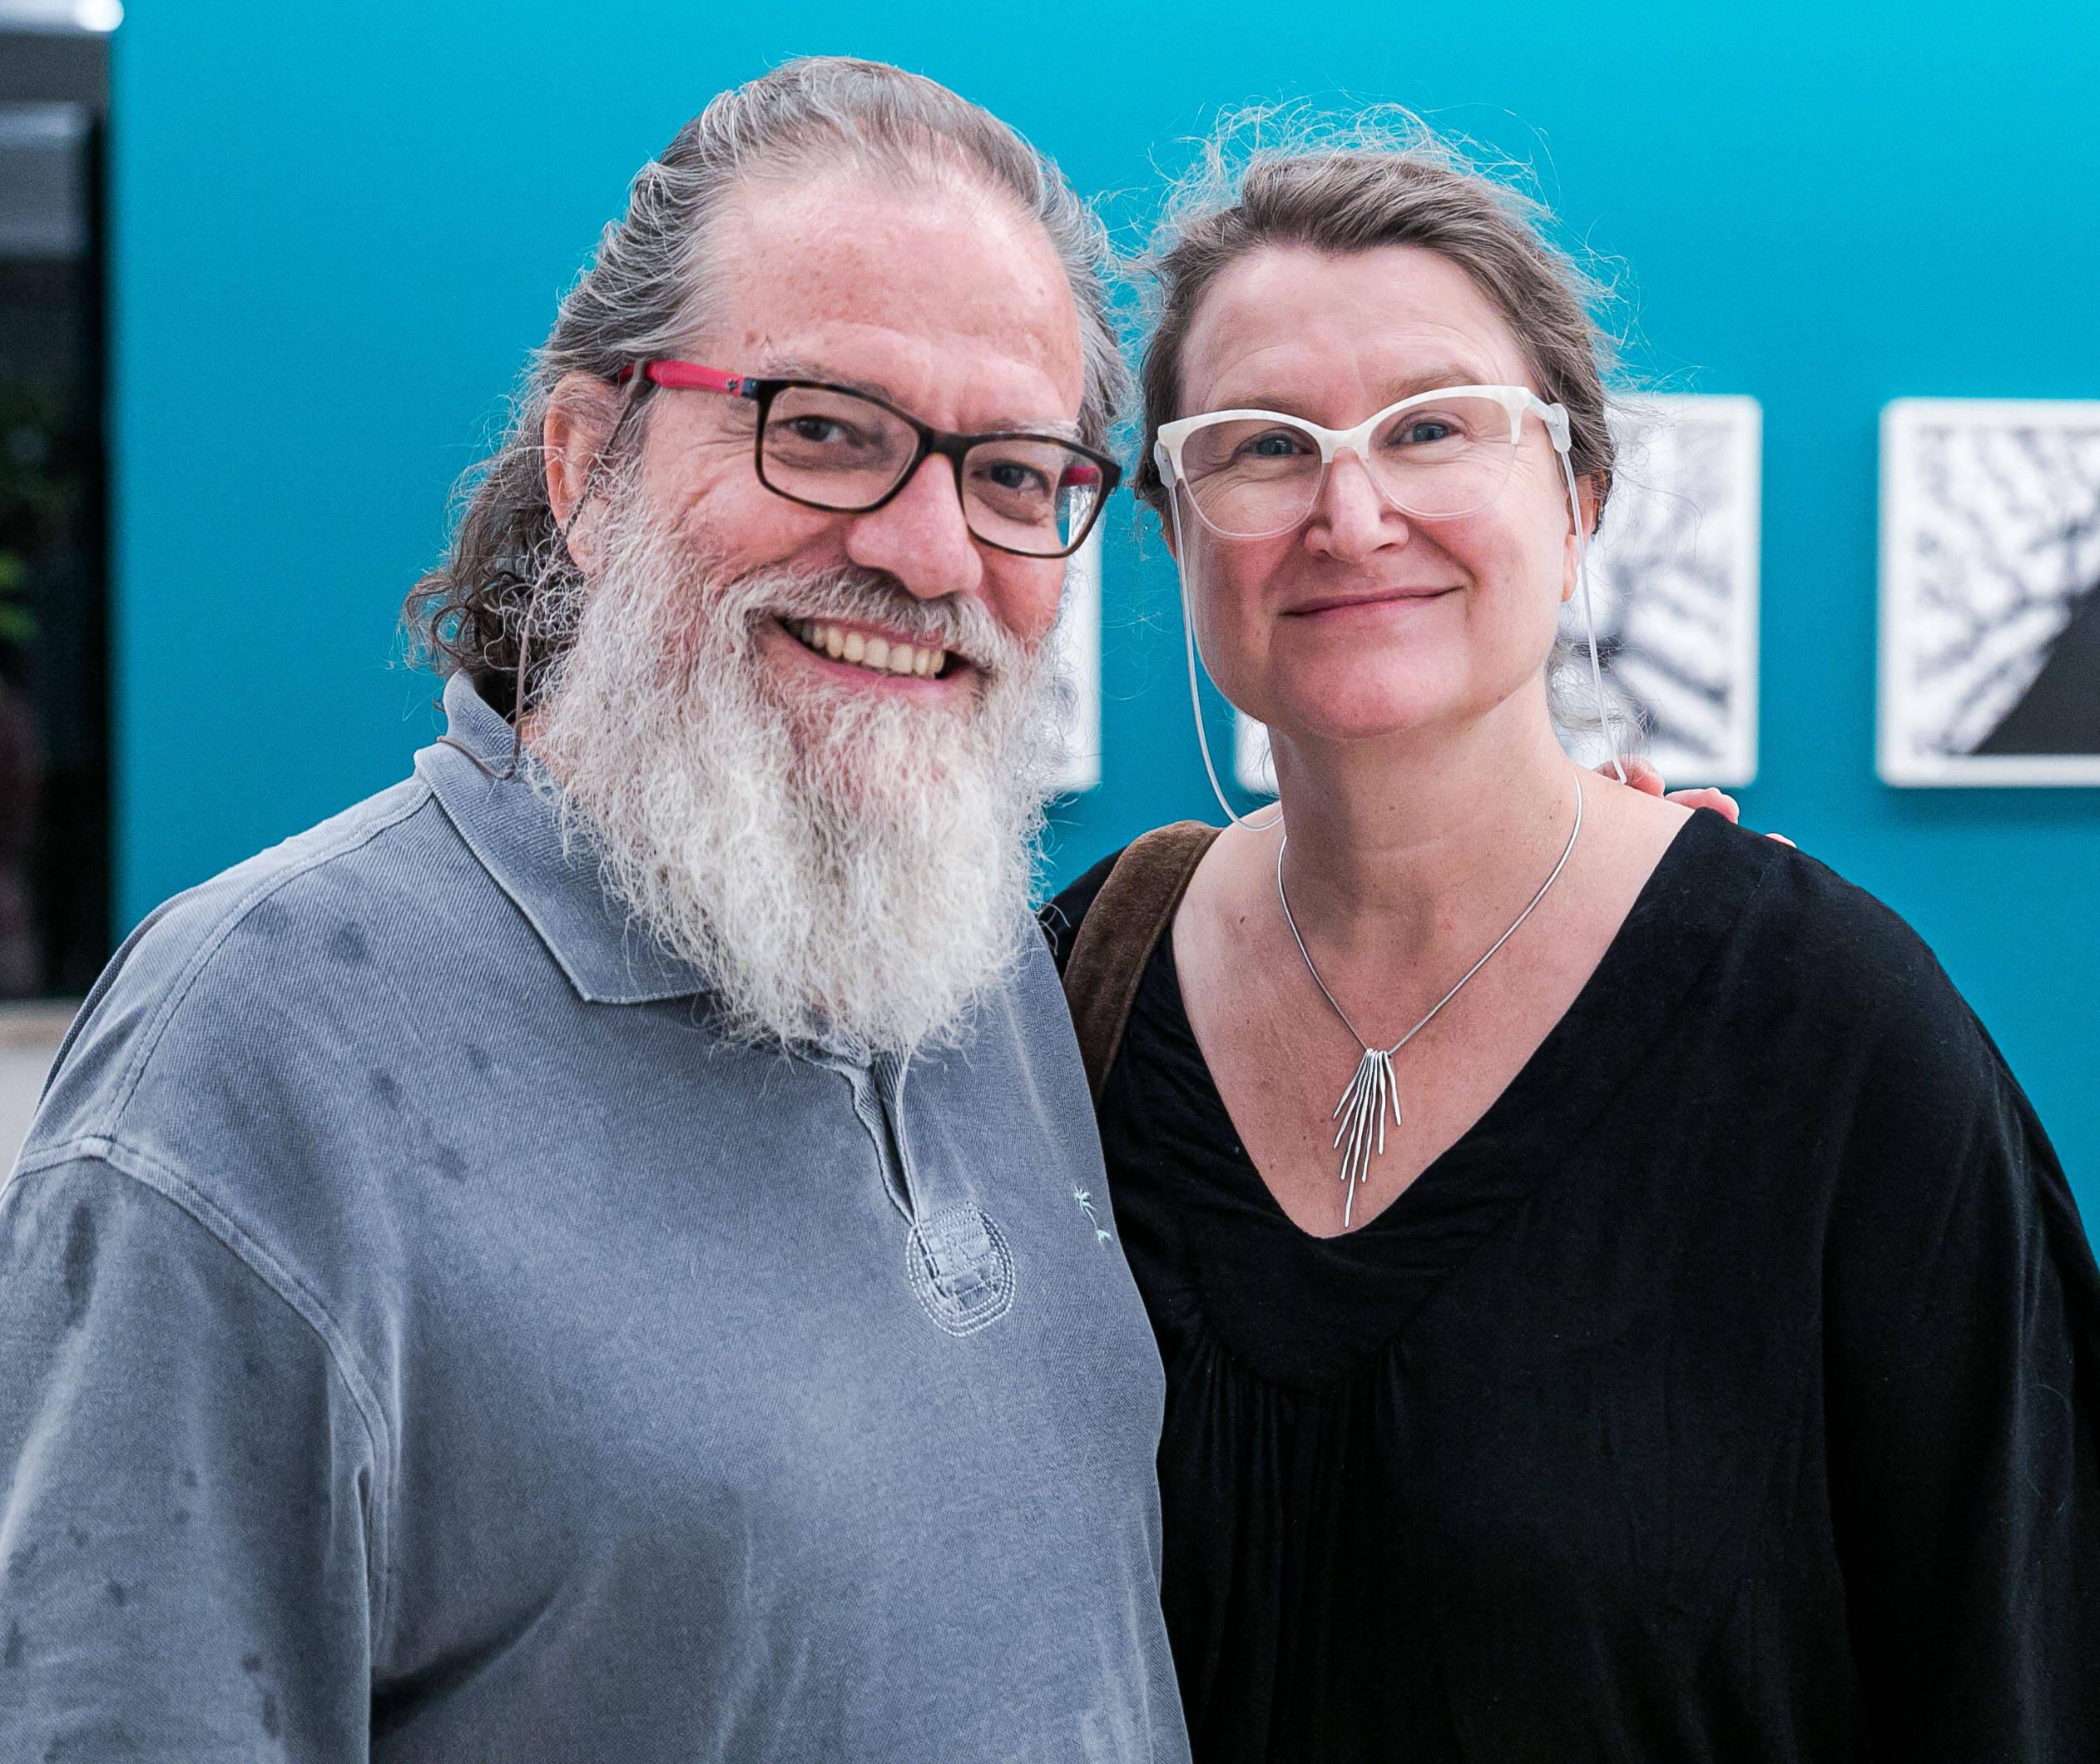 Luiz Guilherme Vergara e Jessica Gogan / Foto: Miguel Sá